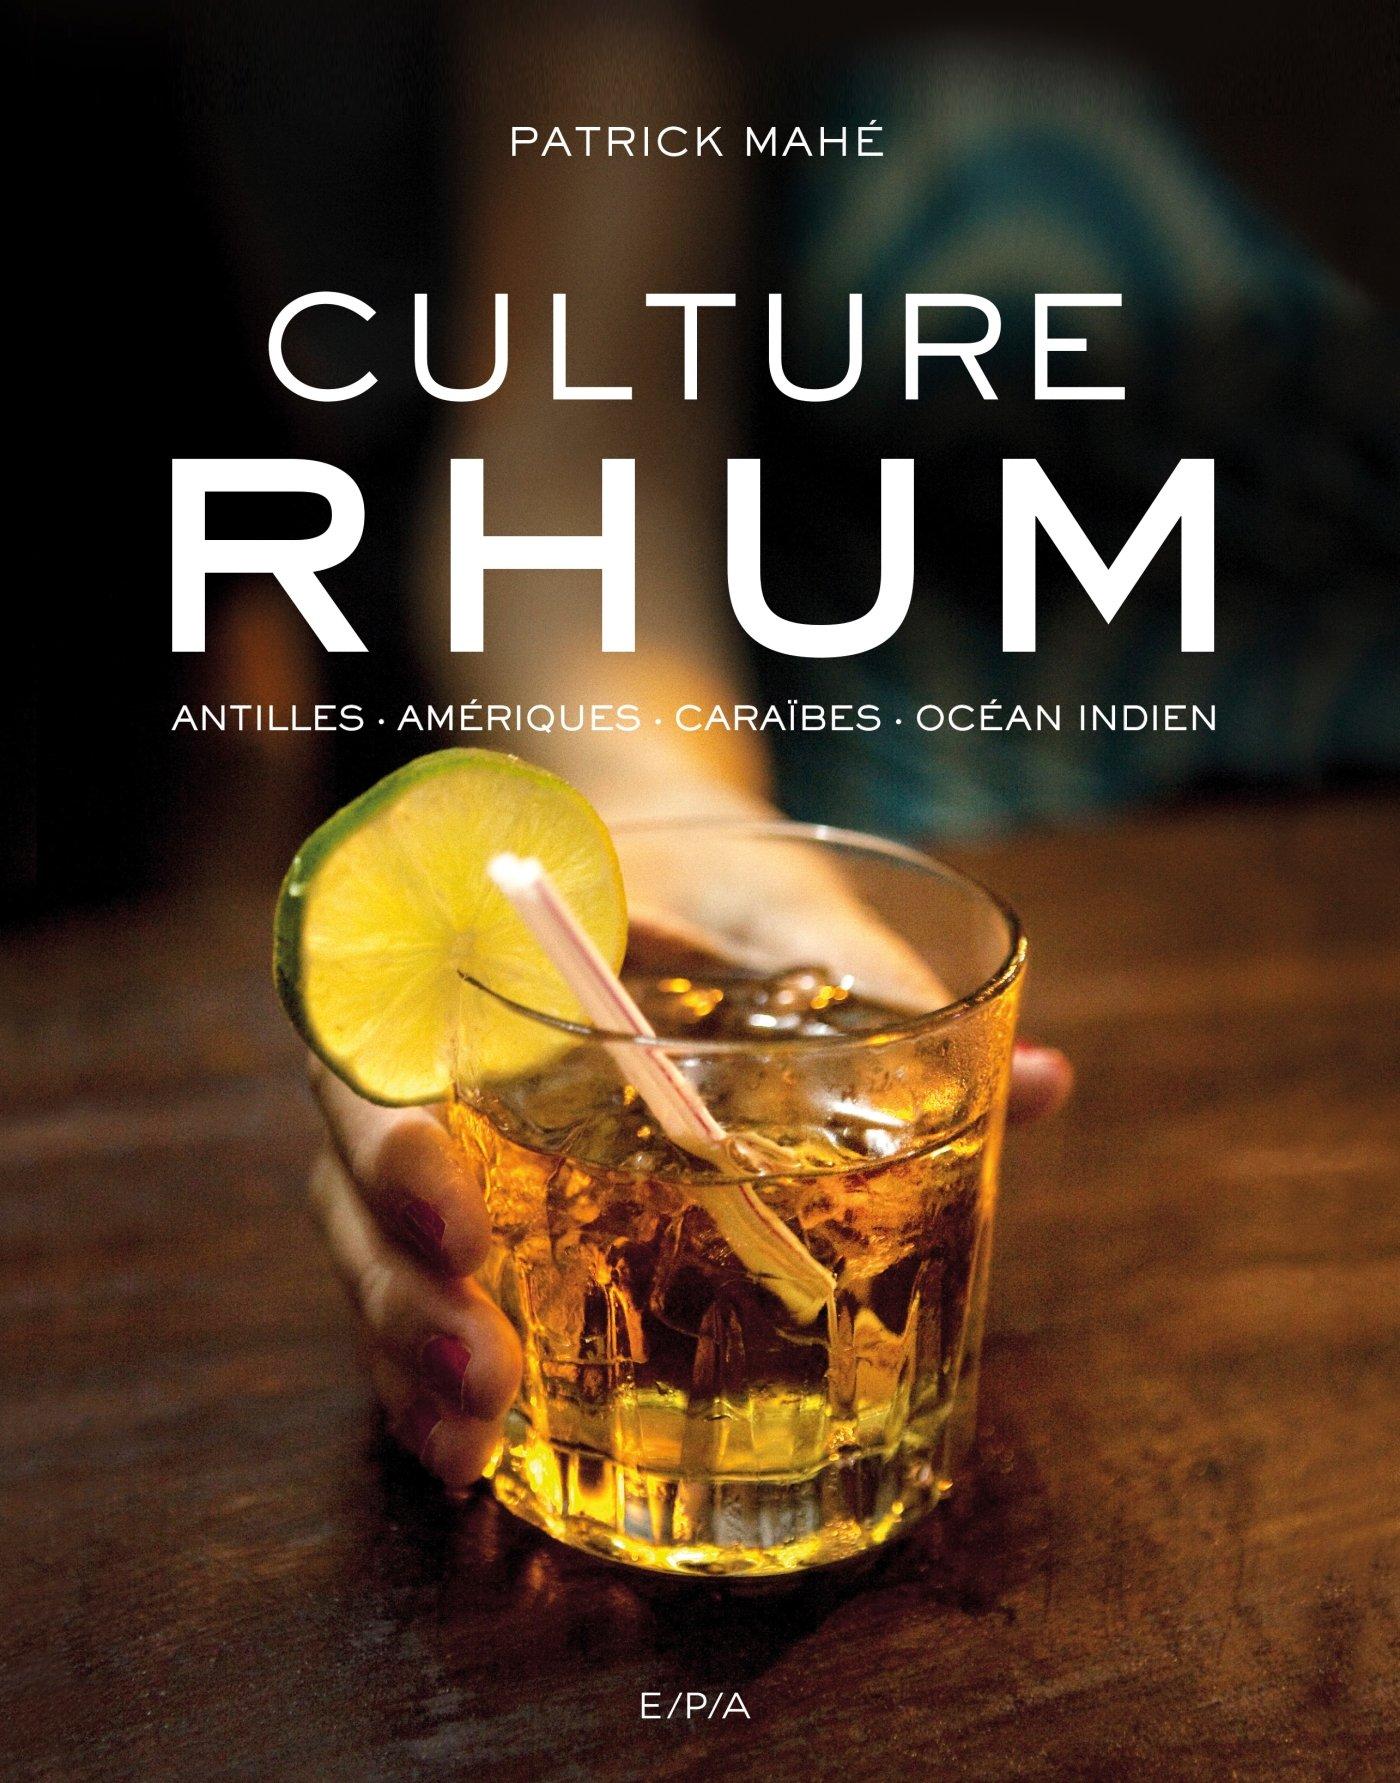 Culture Rhum Broché – 2 novembre 2017 Patrick Mahé E/P/A 2851208942 Cuisine